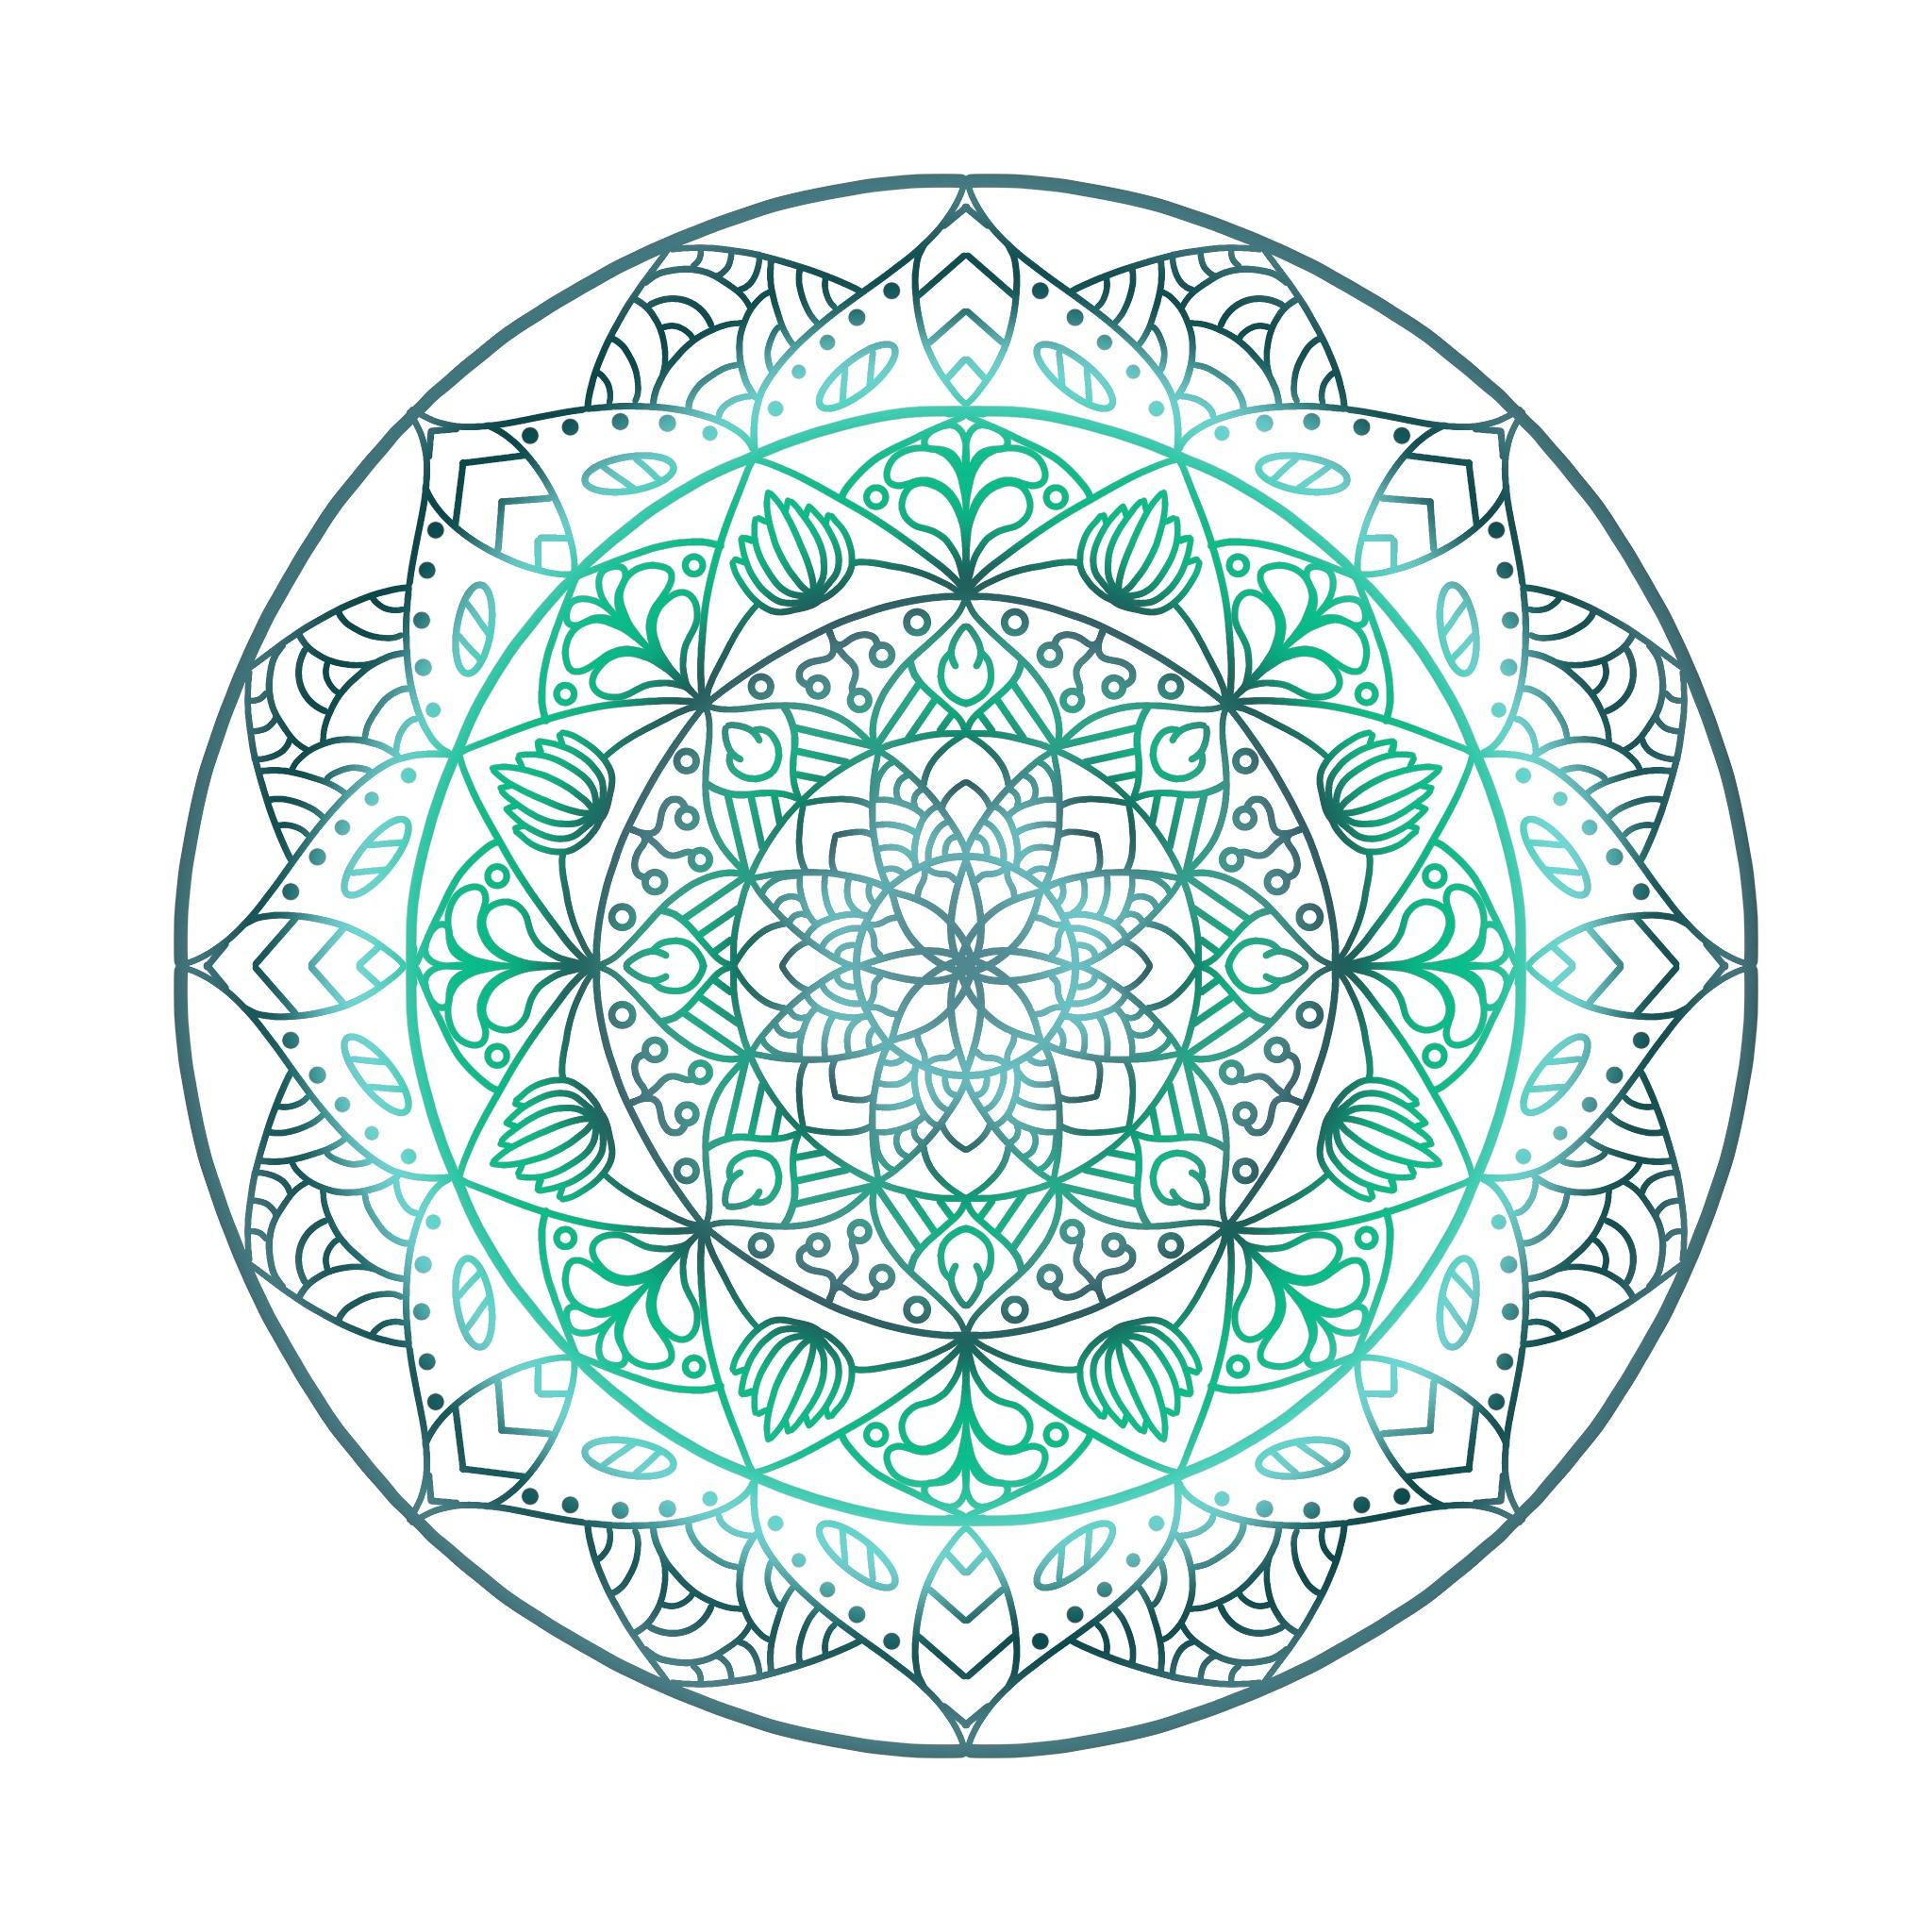 Mandala_21_Colored